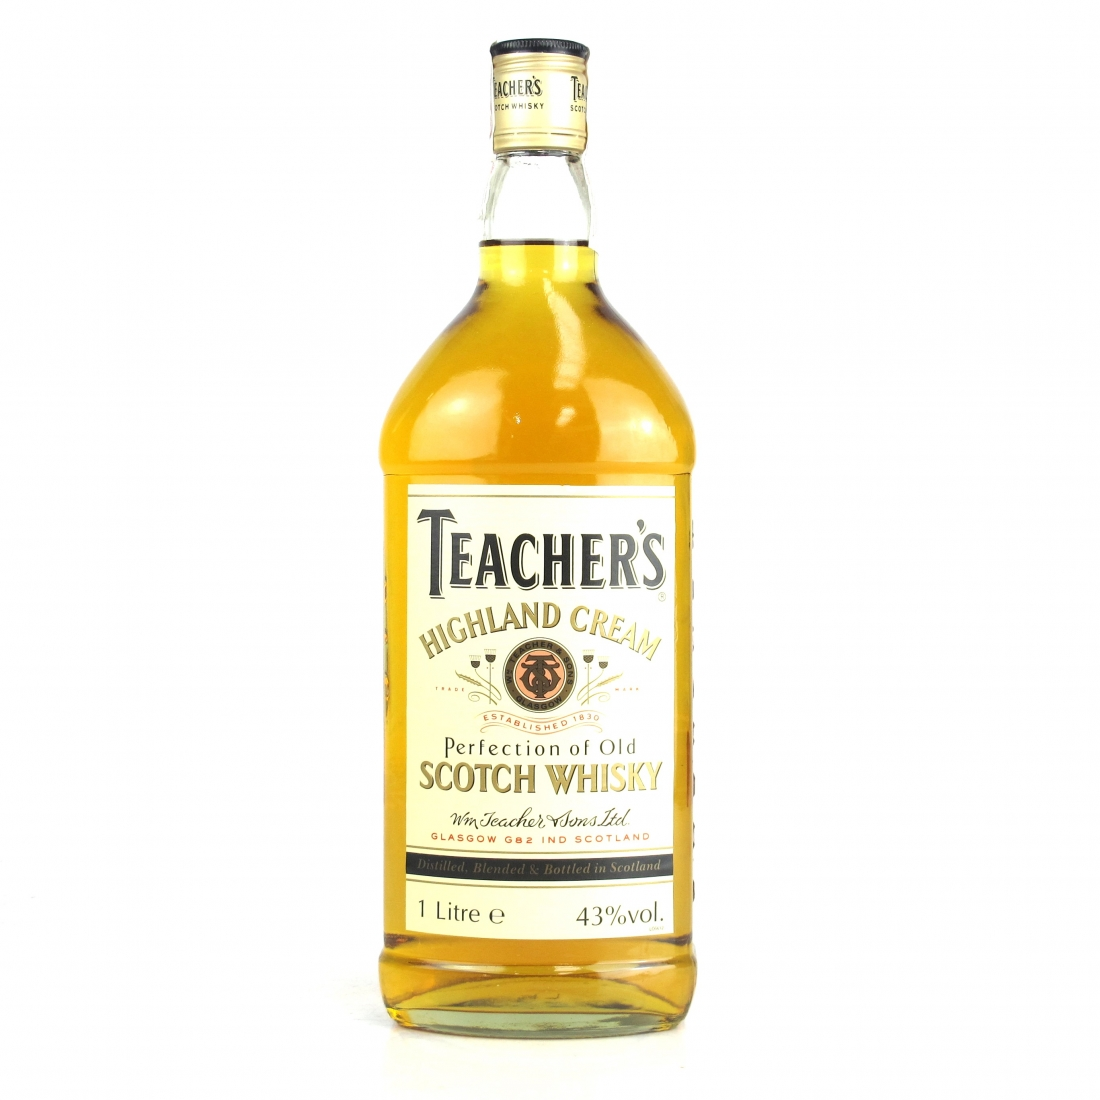 Teacher's Highland Cream 1 Litre